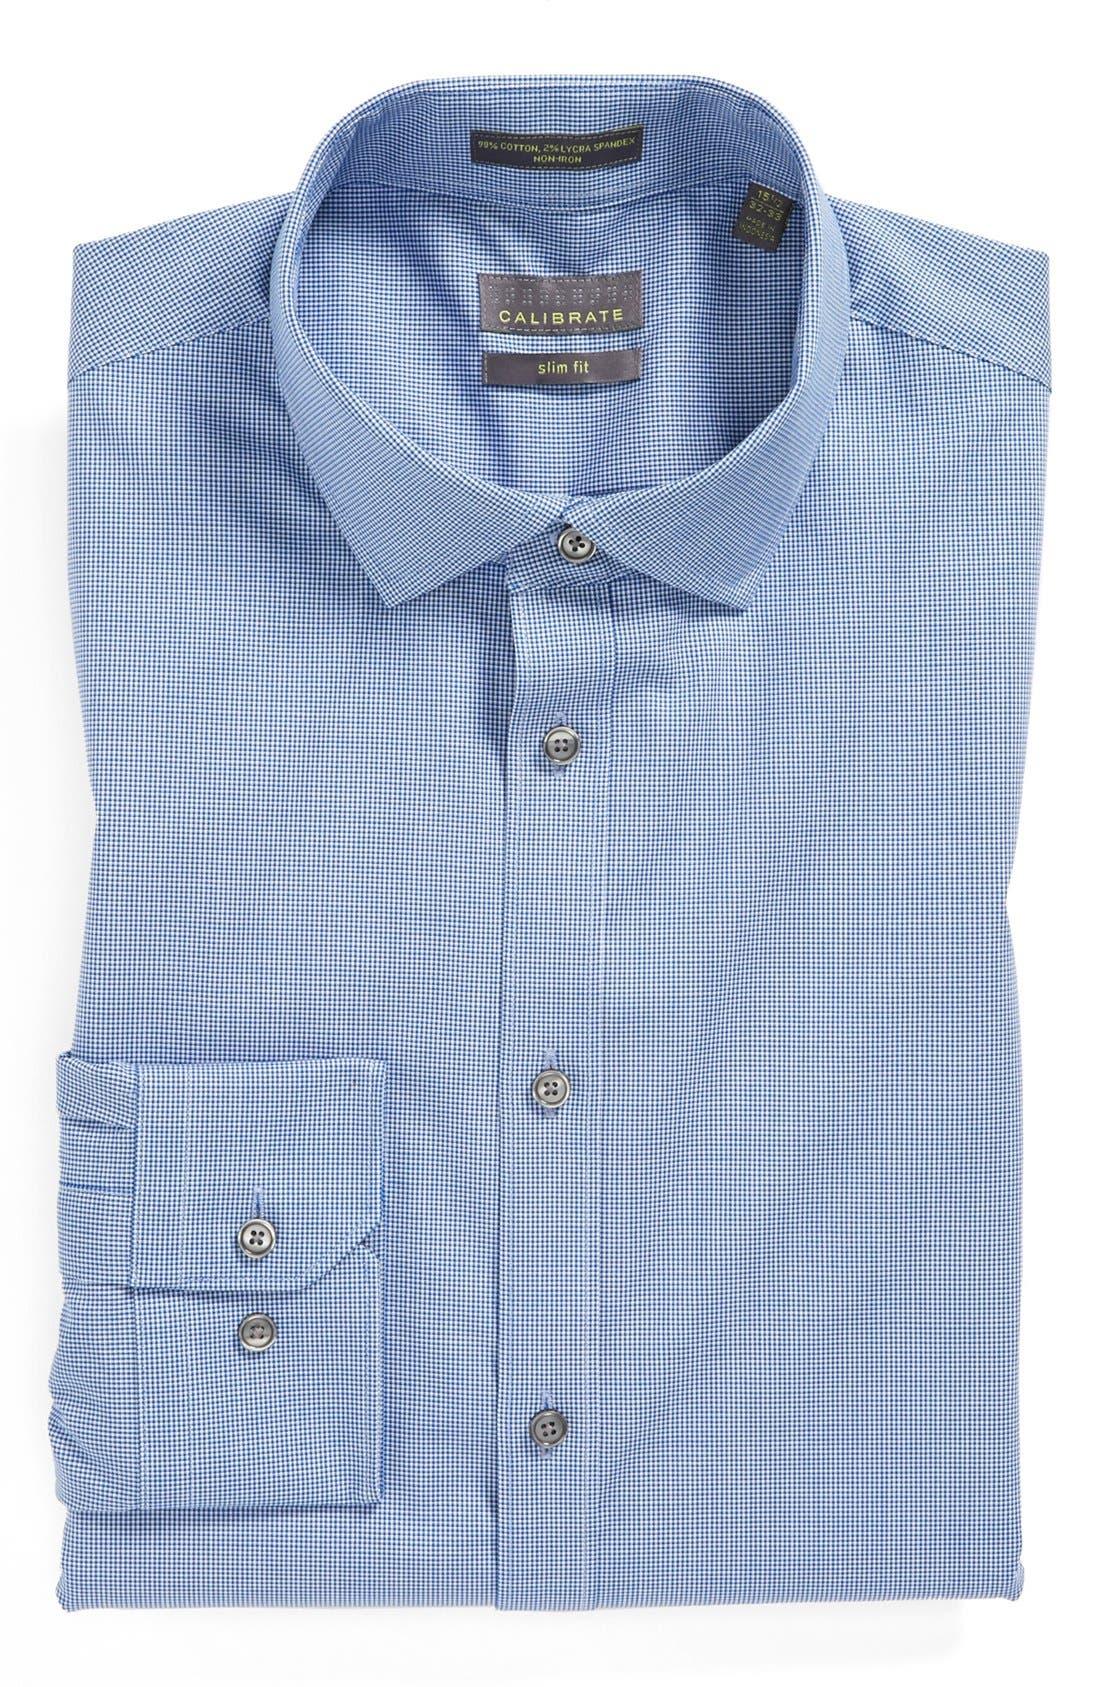 Main Image - Calibrate Extra Trim Fit Non-Iron Microcheck Dress Shirt